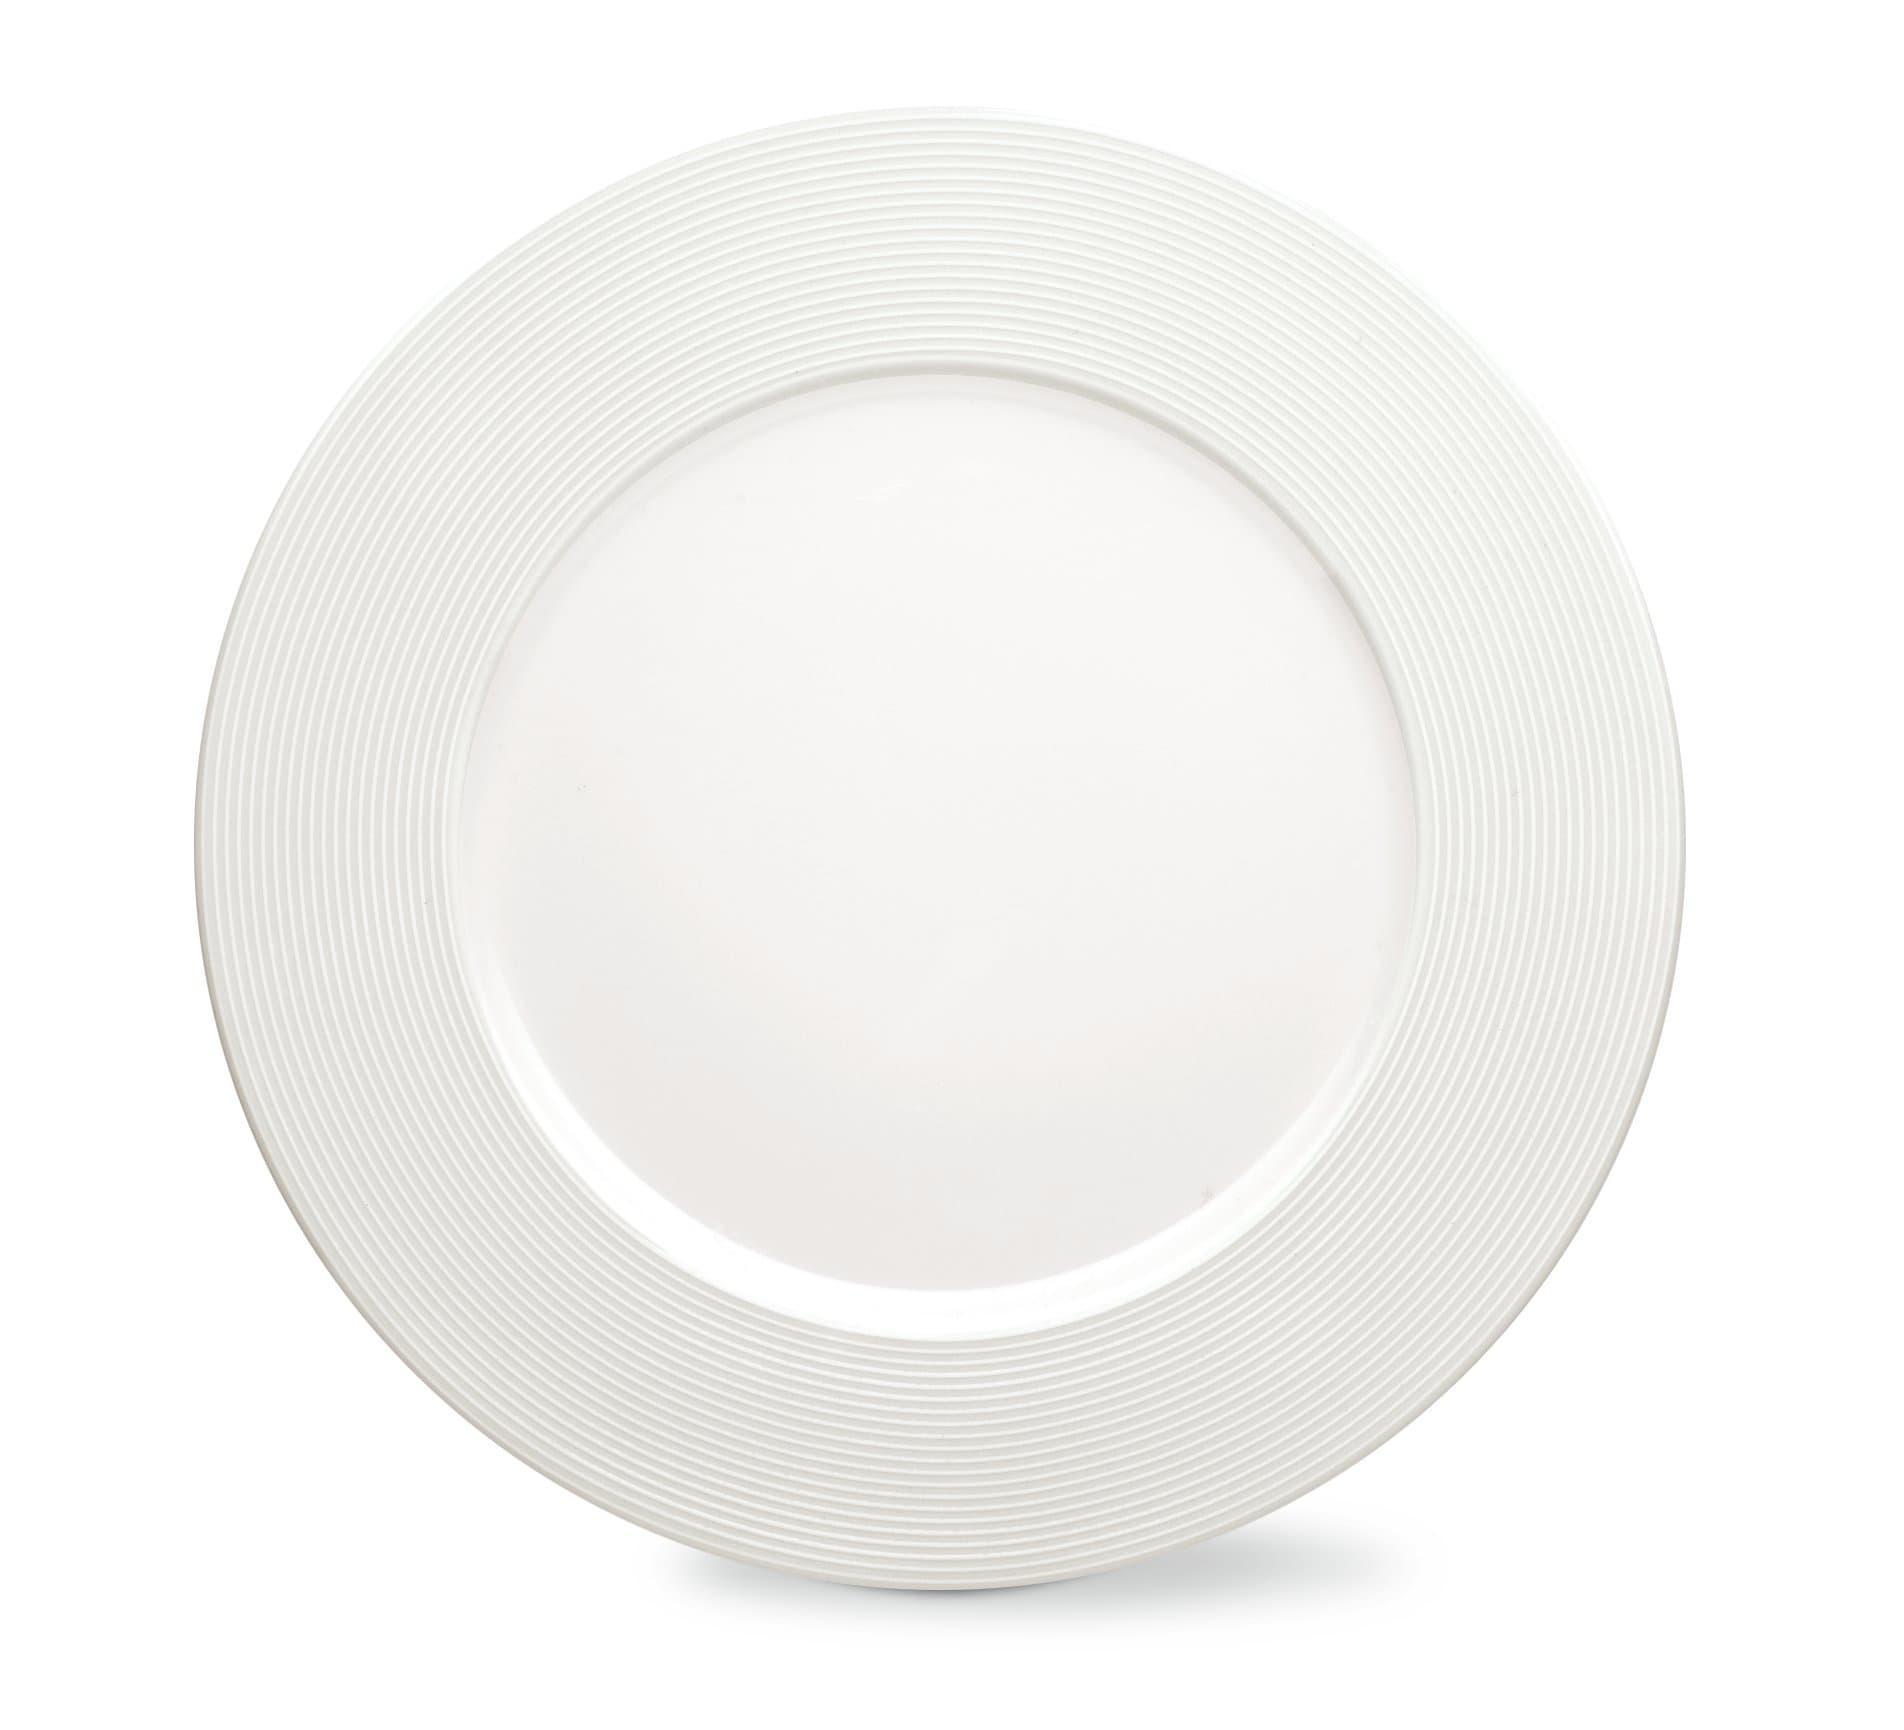 Cucina & Tavola VIENNA Teller flach 27cm